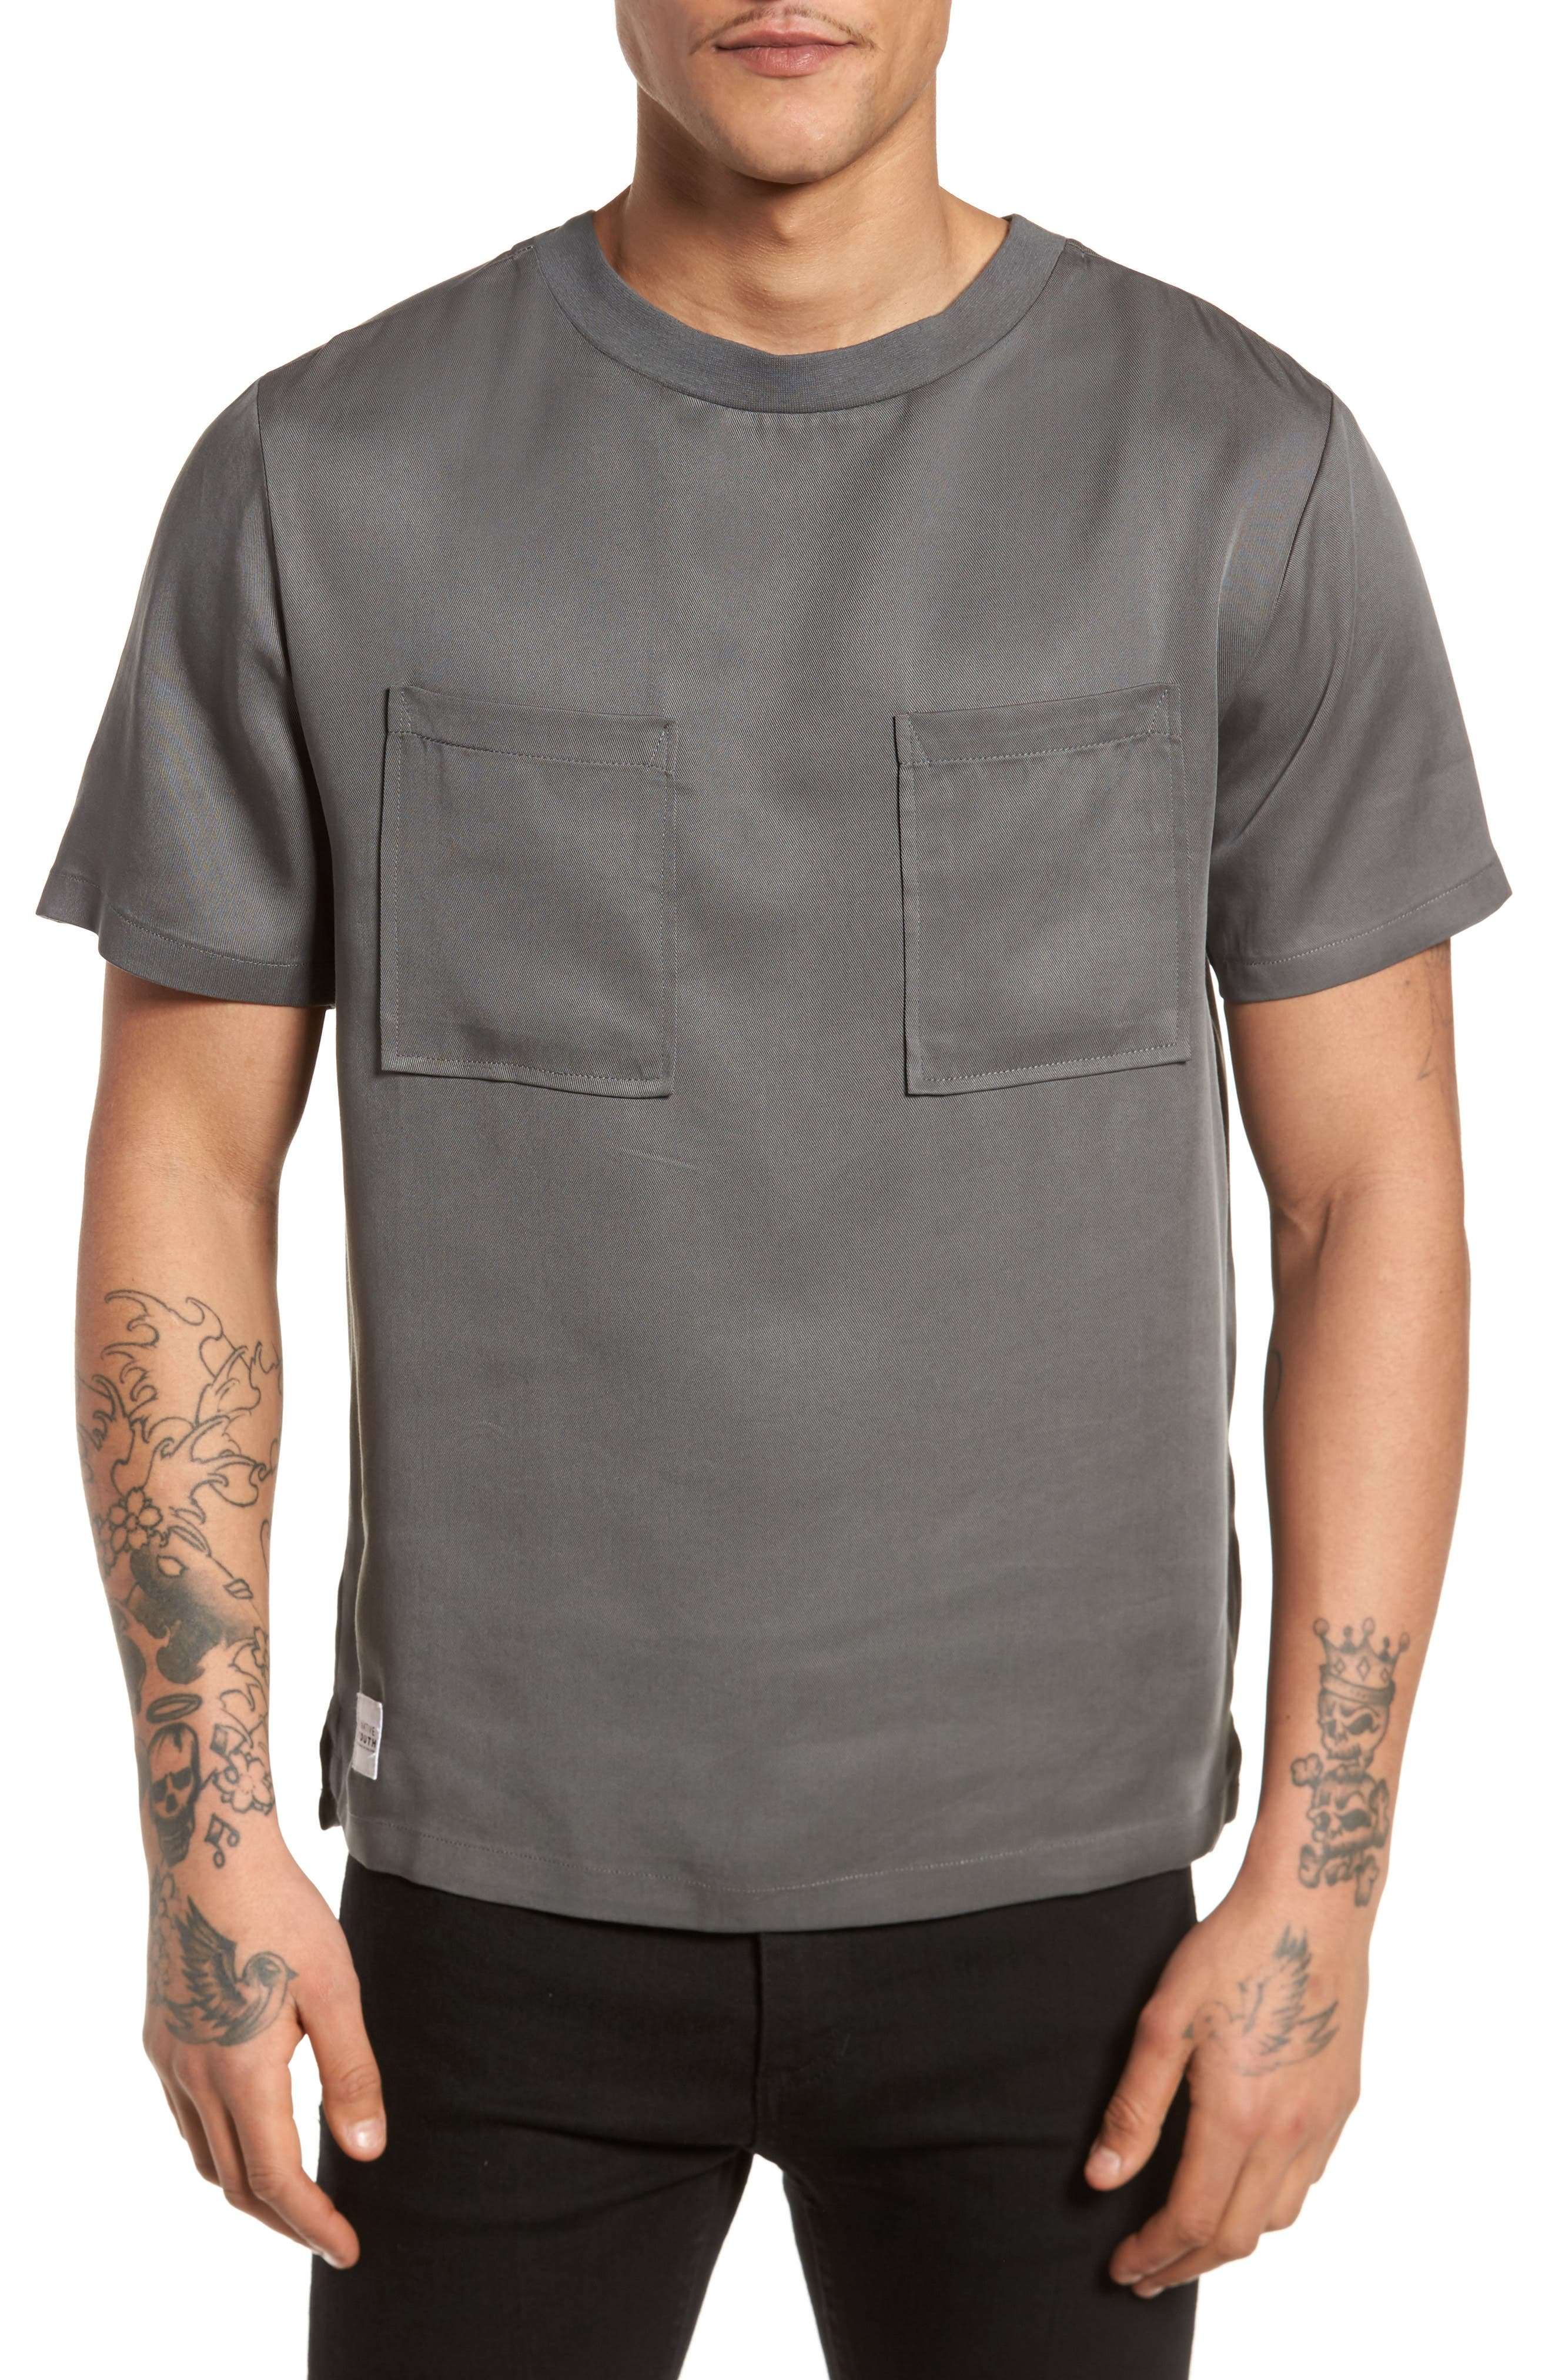 Denali Woven T-Shirt,                             Main thumbnail 1, color,                             020